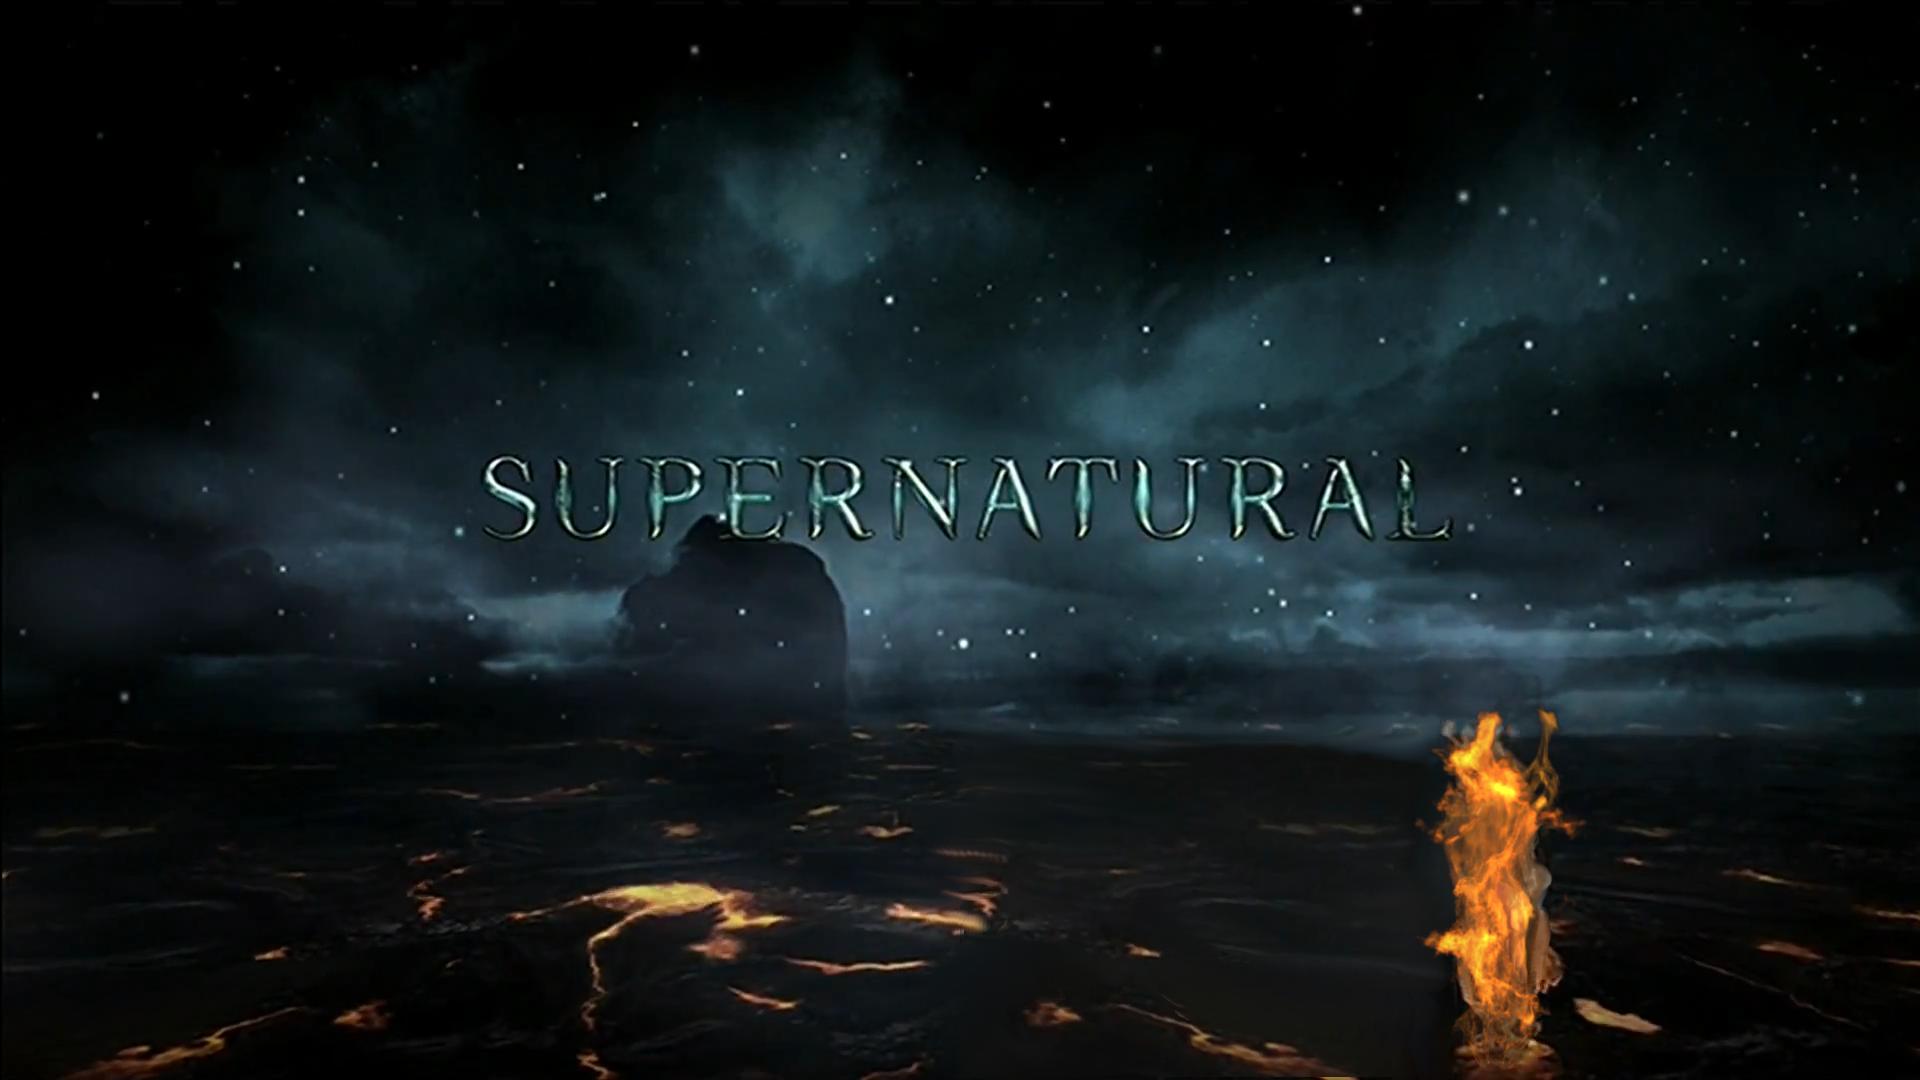 supernatural wallpapers free